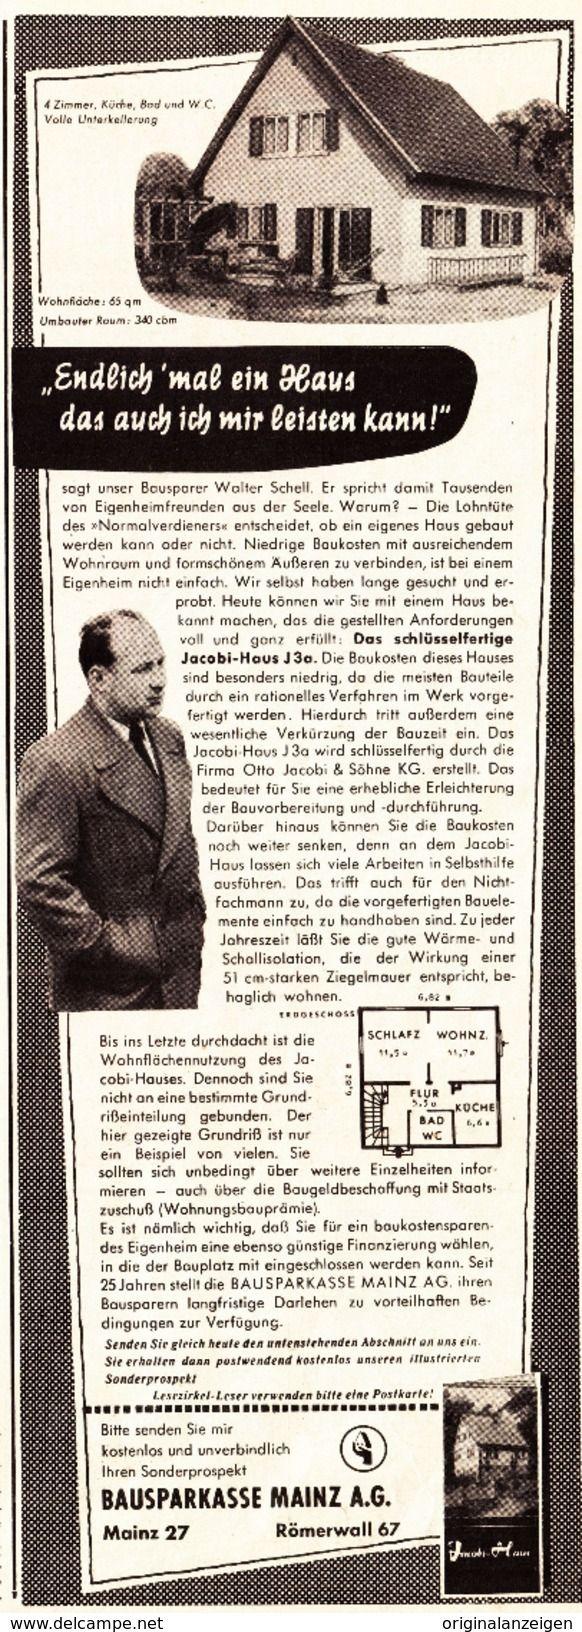 Werbung - Original-Werbung/ Anzeige 1955 - BAUSPARKASSE MAINZ / JACOBI-HAUS / WALTER SCHELL - ca. 115 x 310 mm